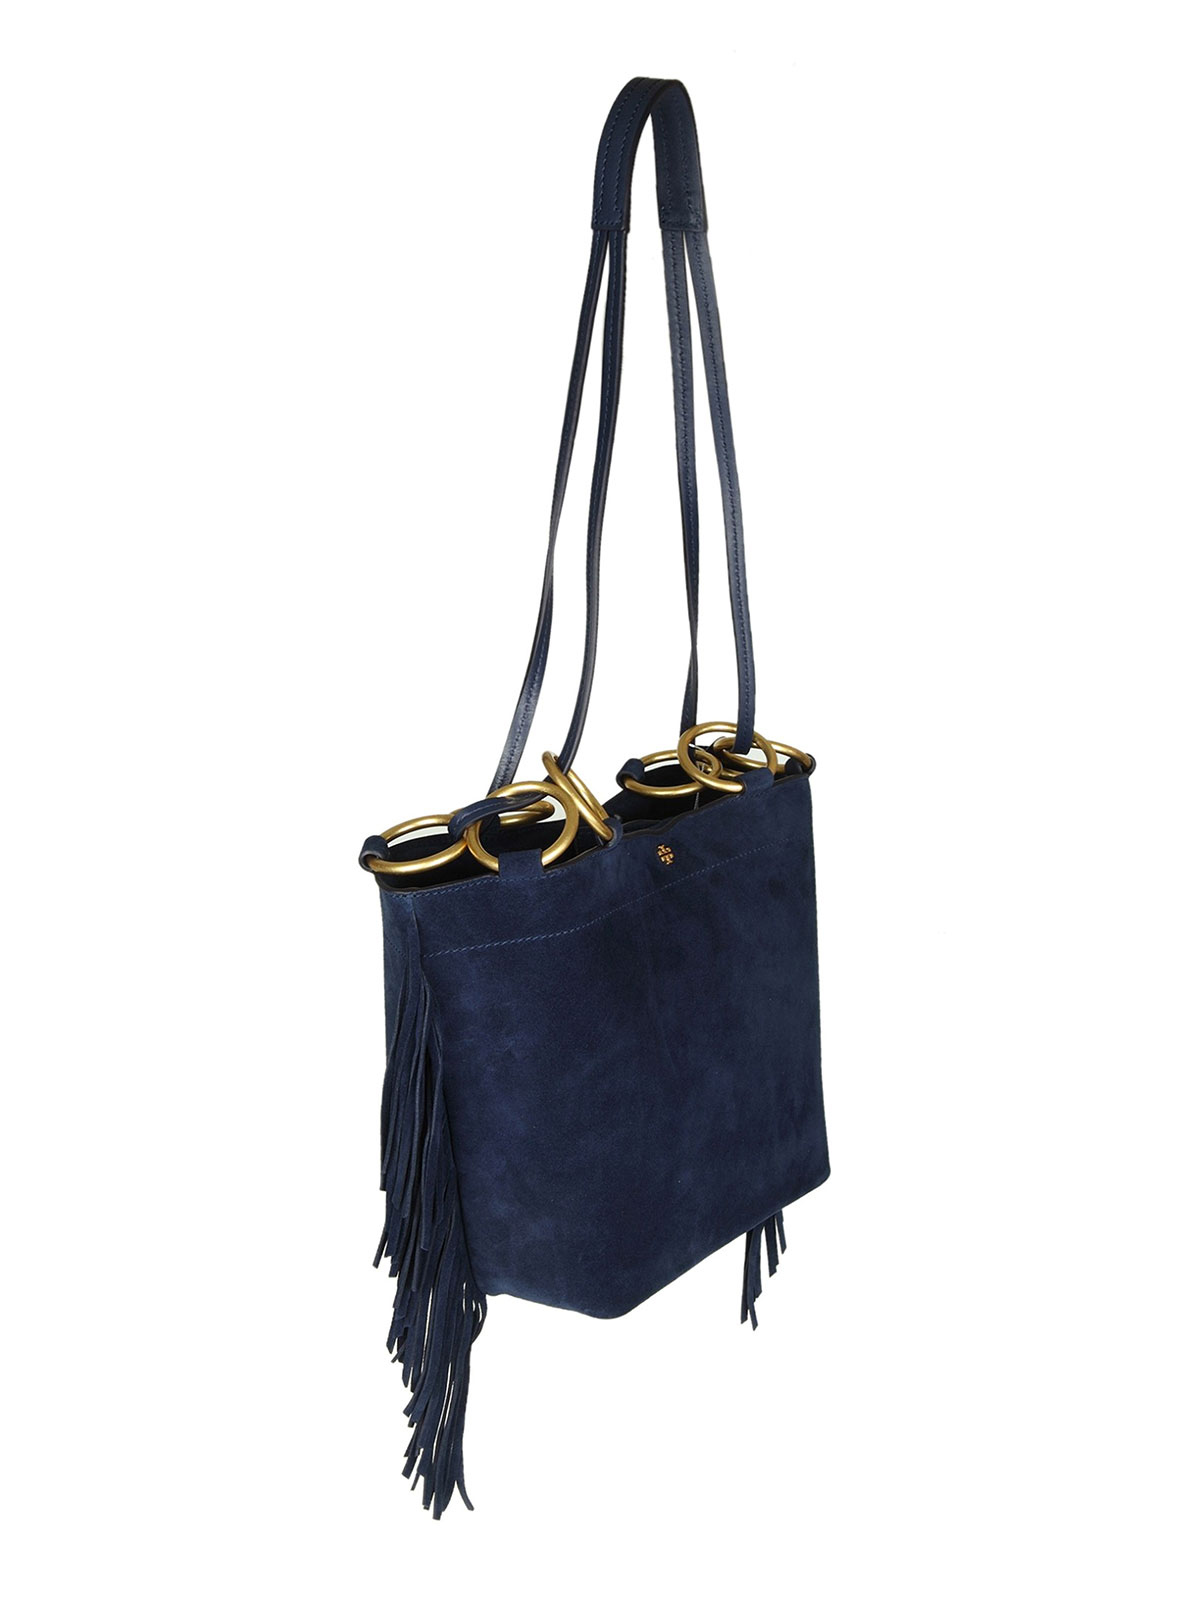 0b9b8ddbd5a Tory Burch - Farrah Fringe small leather bag - shoulder bags - 49244403